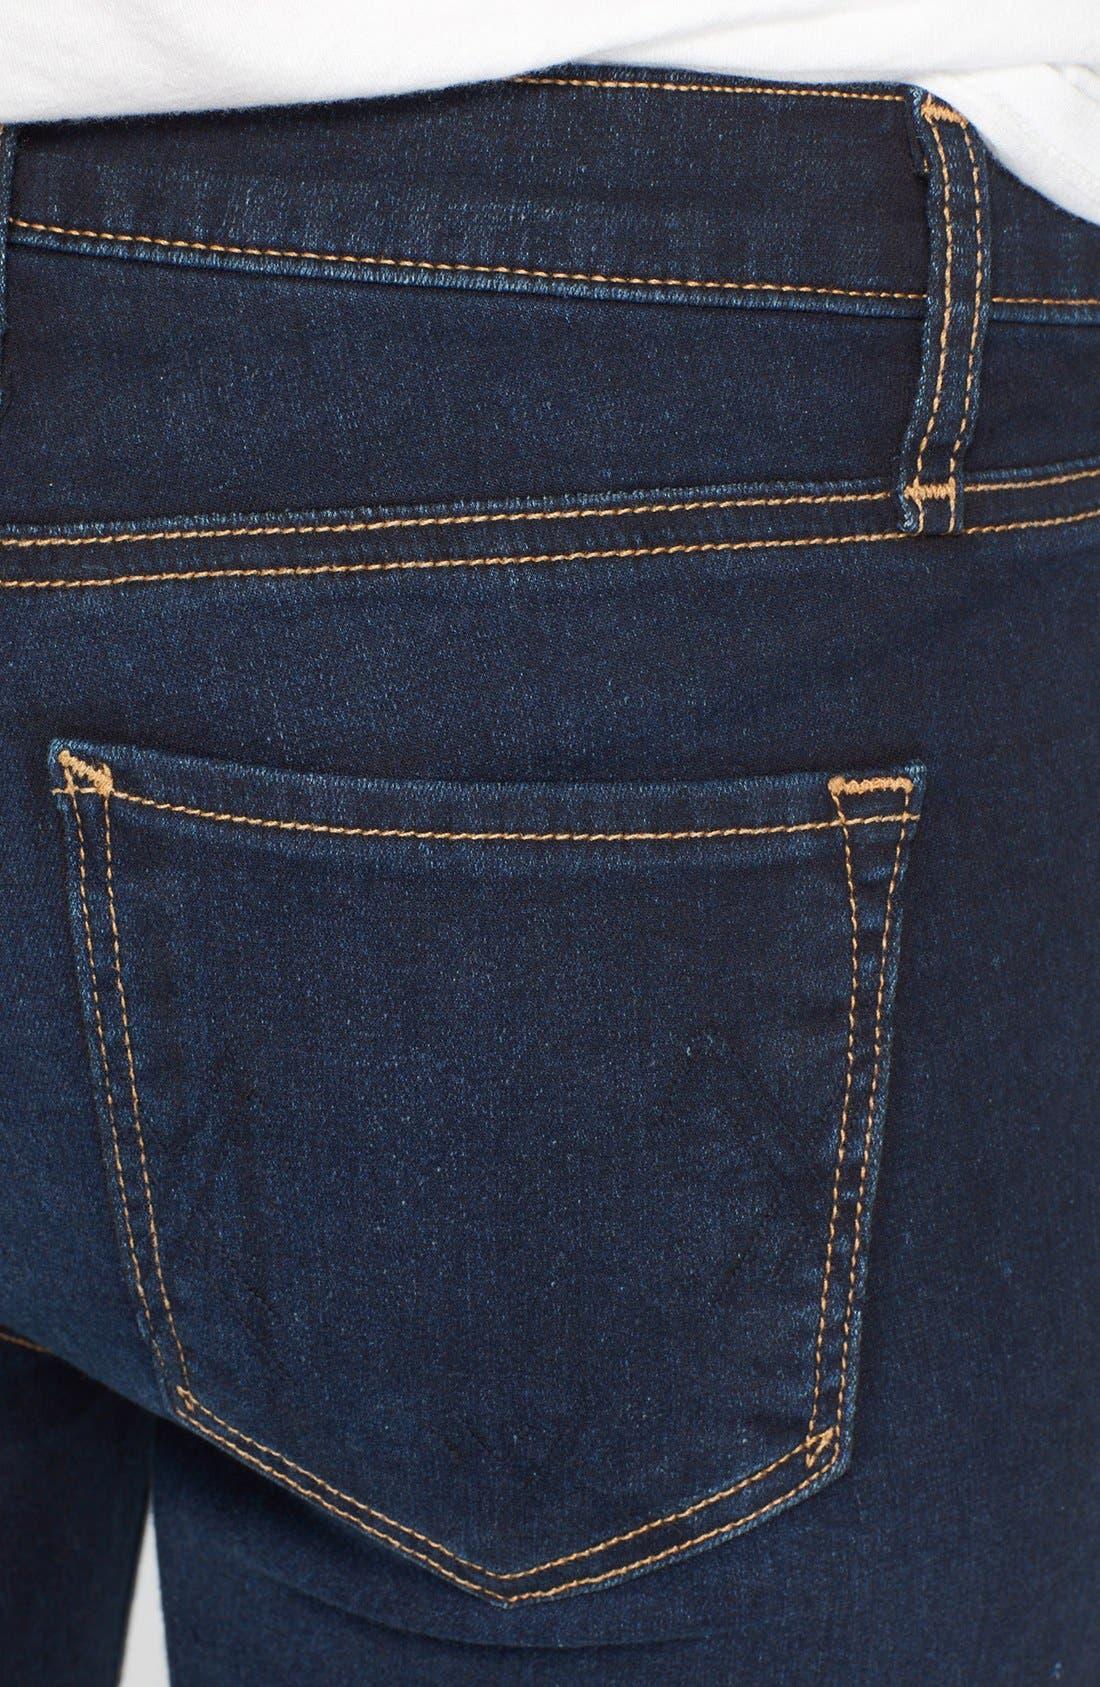 Alternate Image 3  - McGuire Skinny Ankle Jeans (Atlantic Blue)